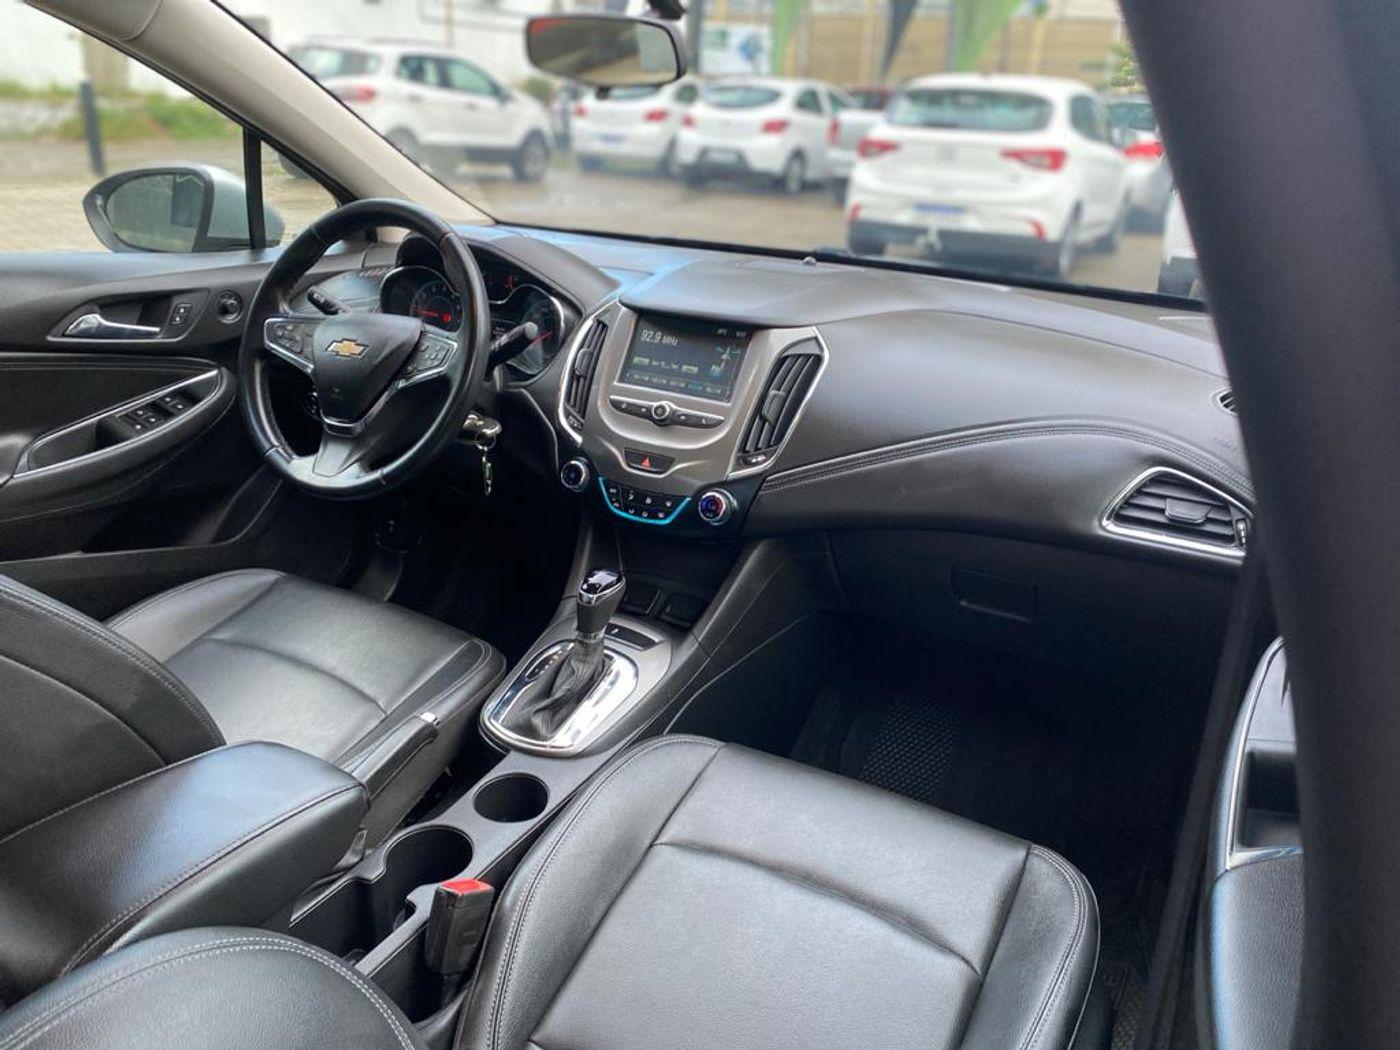 Chevrolet CRUZE LT 1.4 16V Turbo Flex 4p Aut.